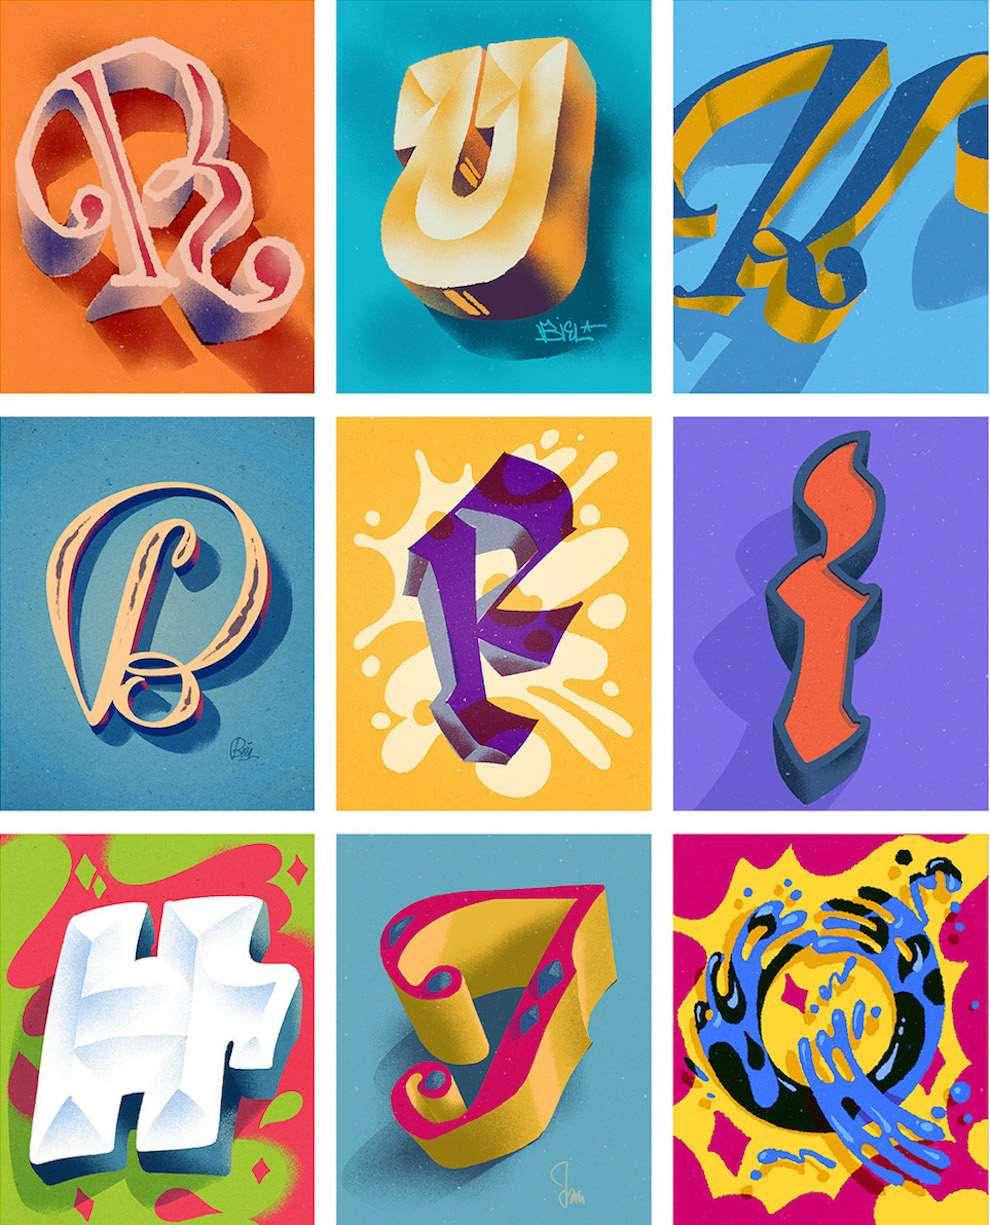 Jan Bielecki, Digital illustration of the alphabets. Typography